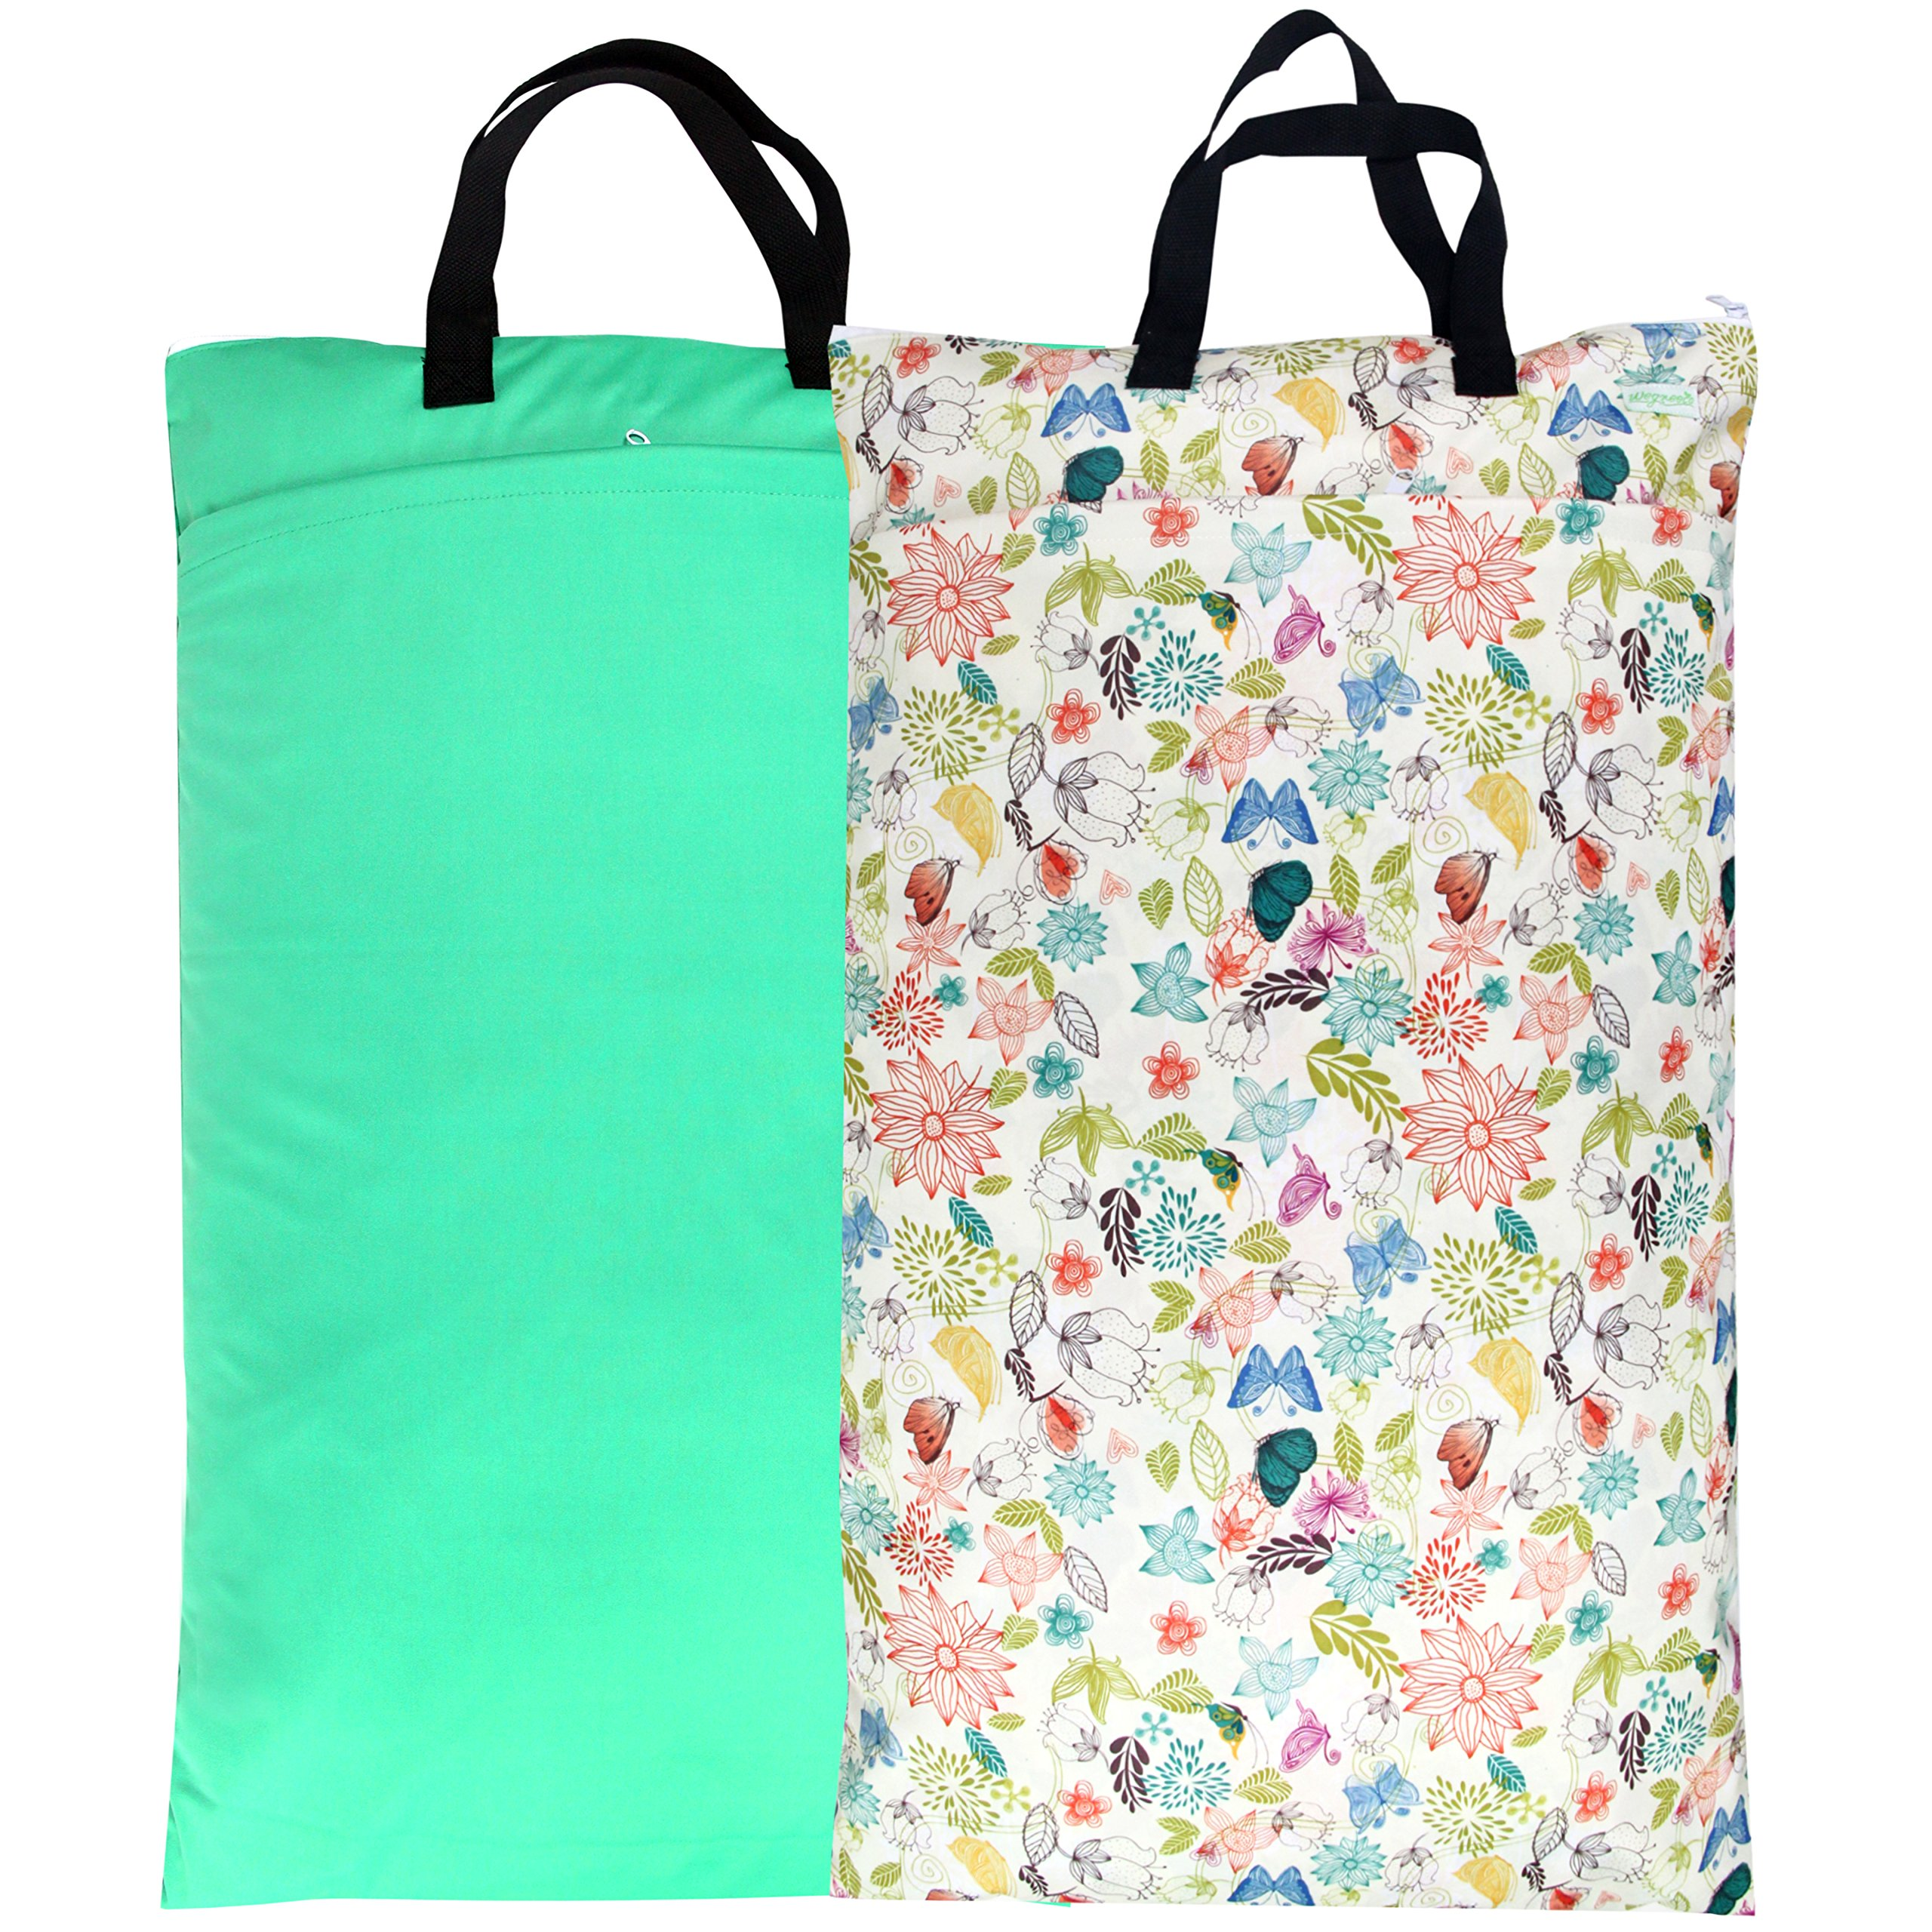 Wegreeco Reusable Hanging Wet Dry Cloth Diaper Bag(2 PACK,Jade,Camellia)